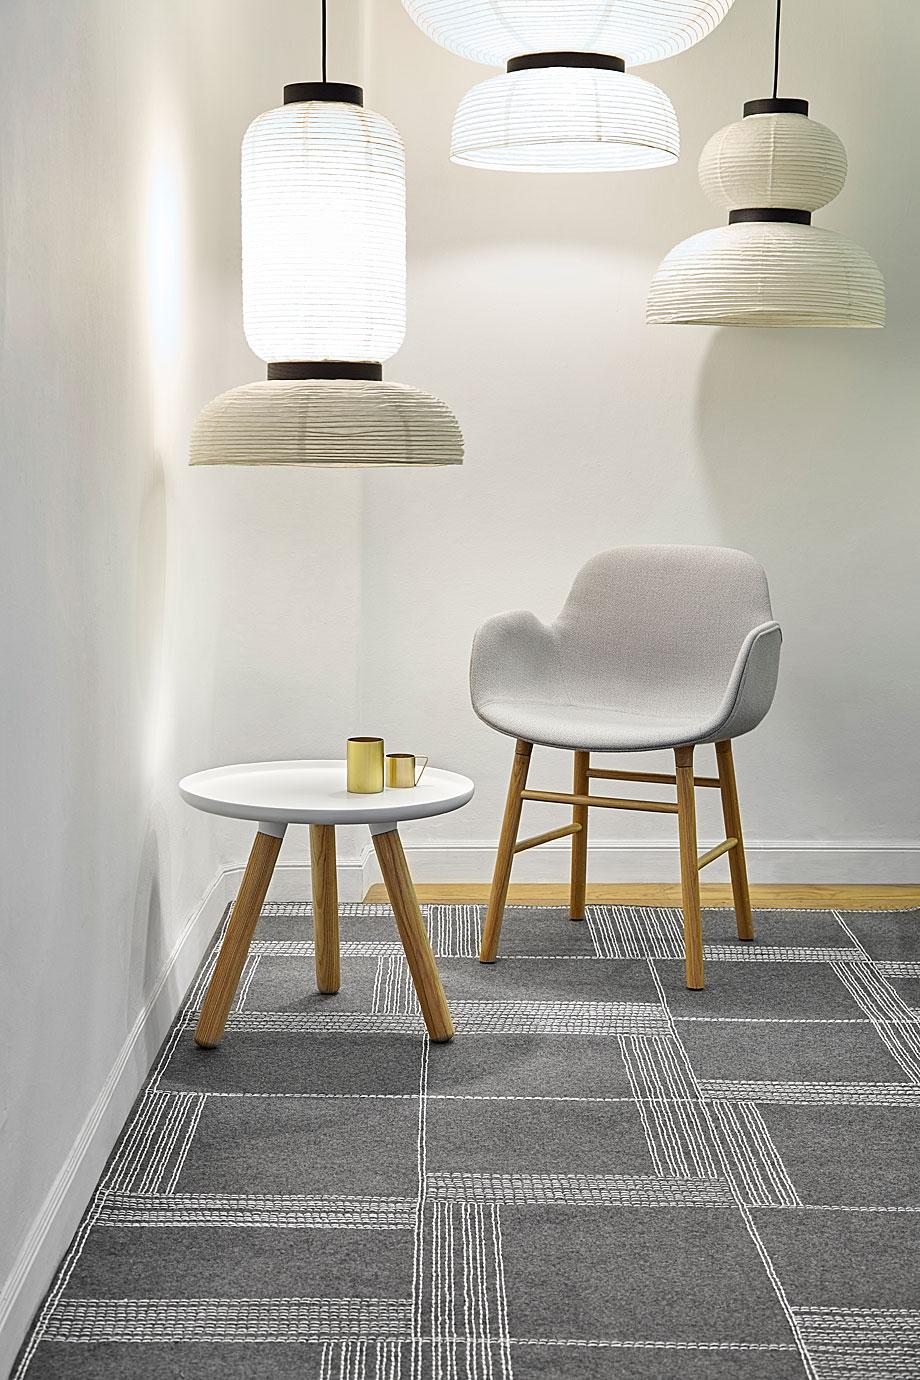 alfombra-oryza-odosdesign-gan-1